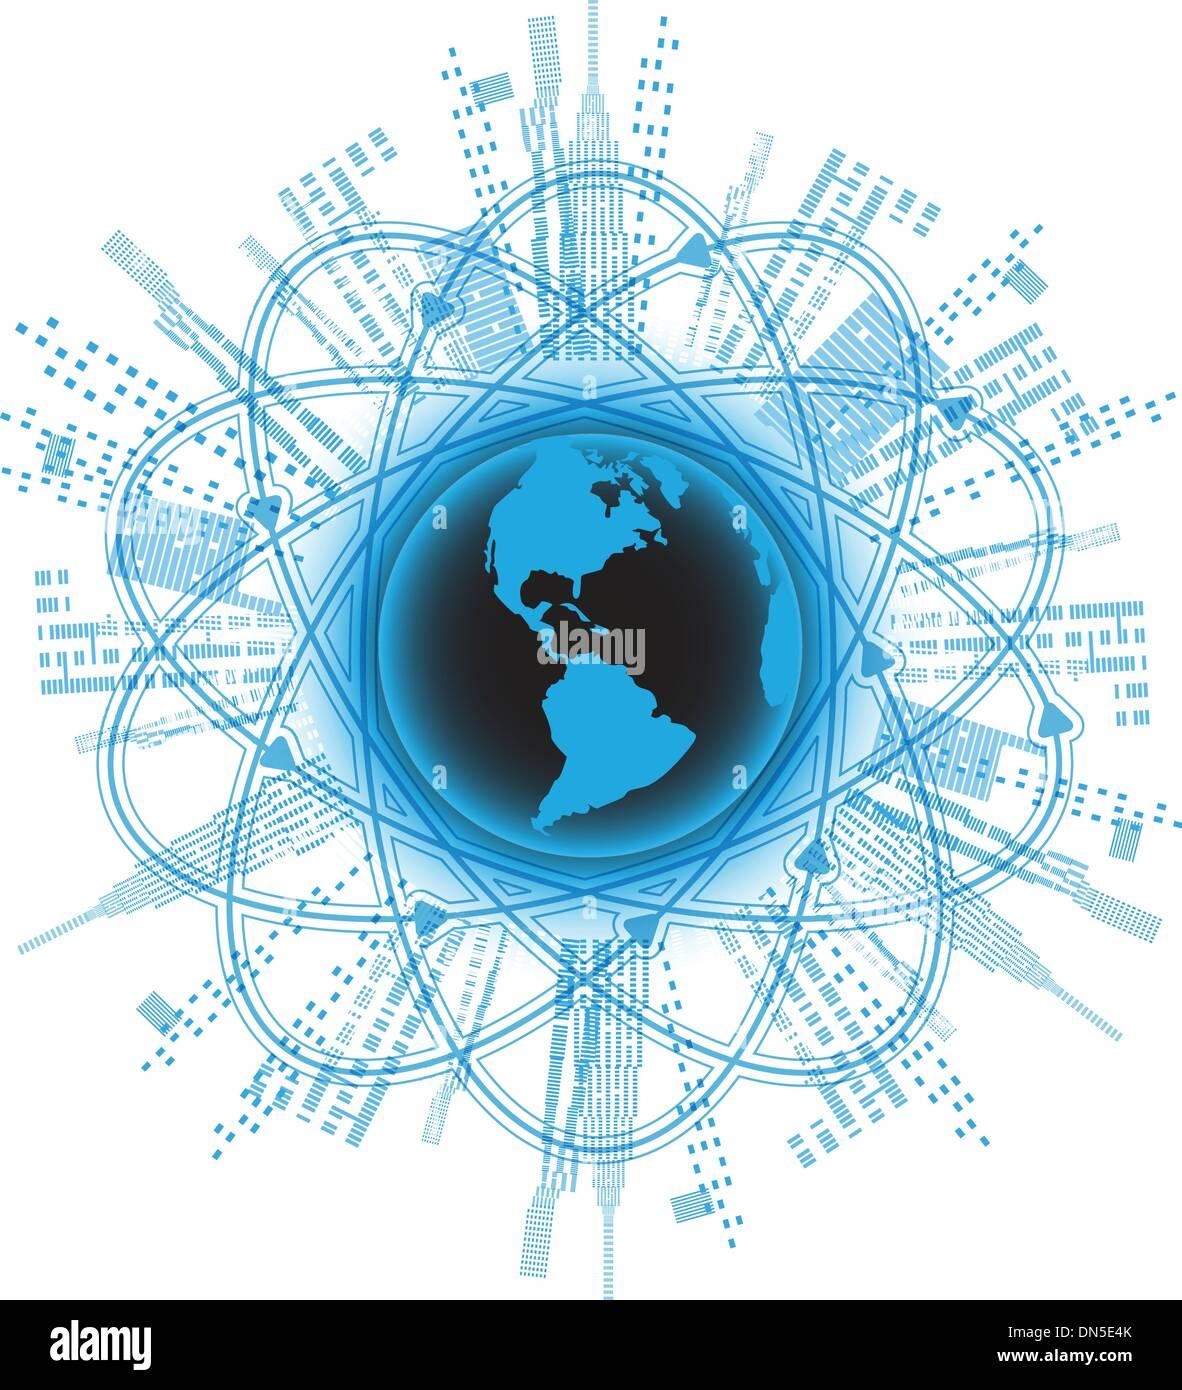 globalization - Stock Image